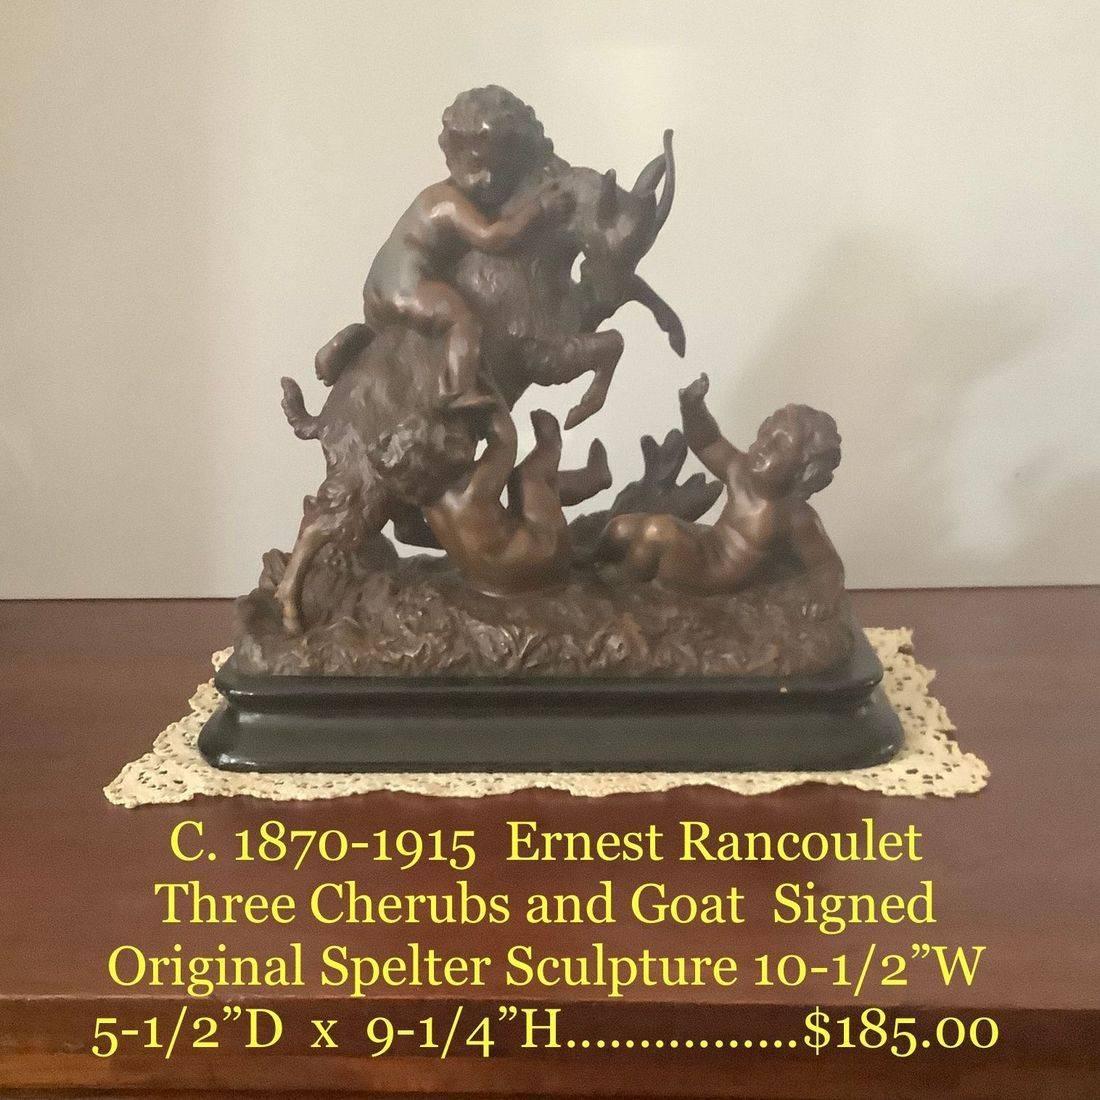 C. 1870-1915 Ernest Rancoulet Three Cherubs and Goat Signed Original Spelter Sculpture   $185.00